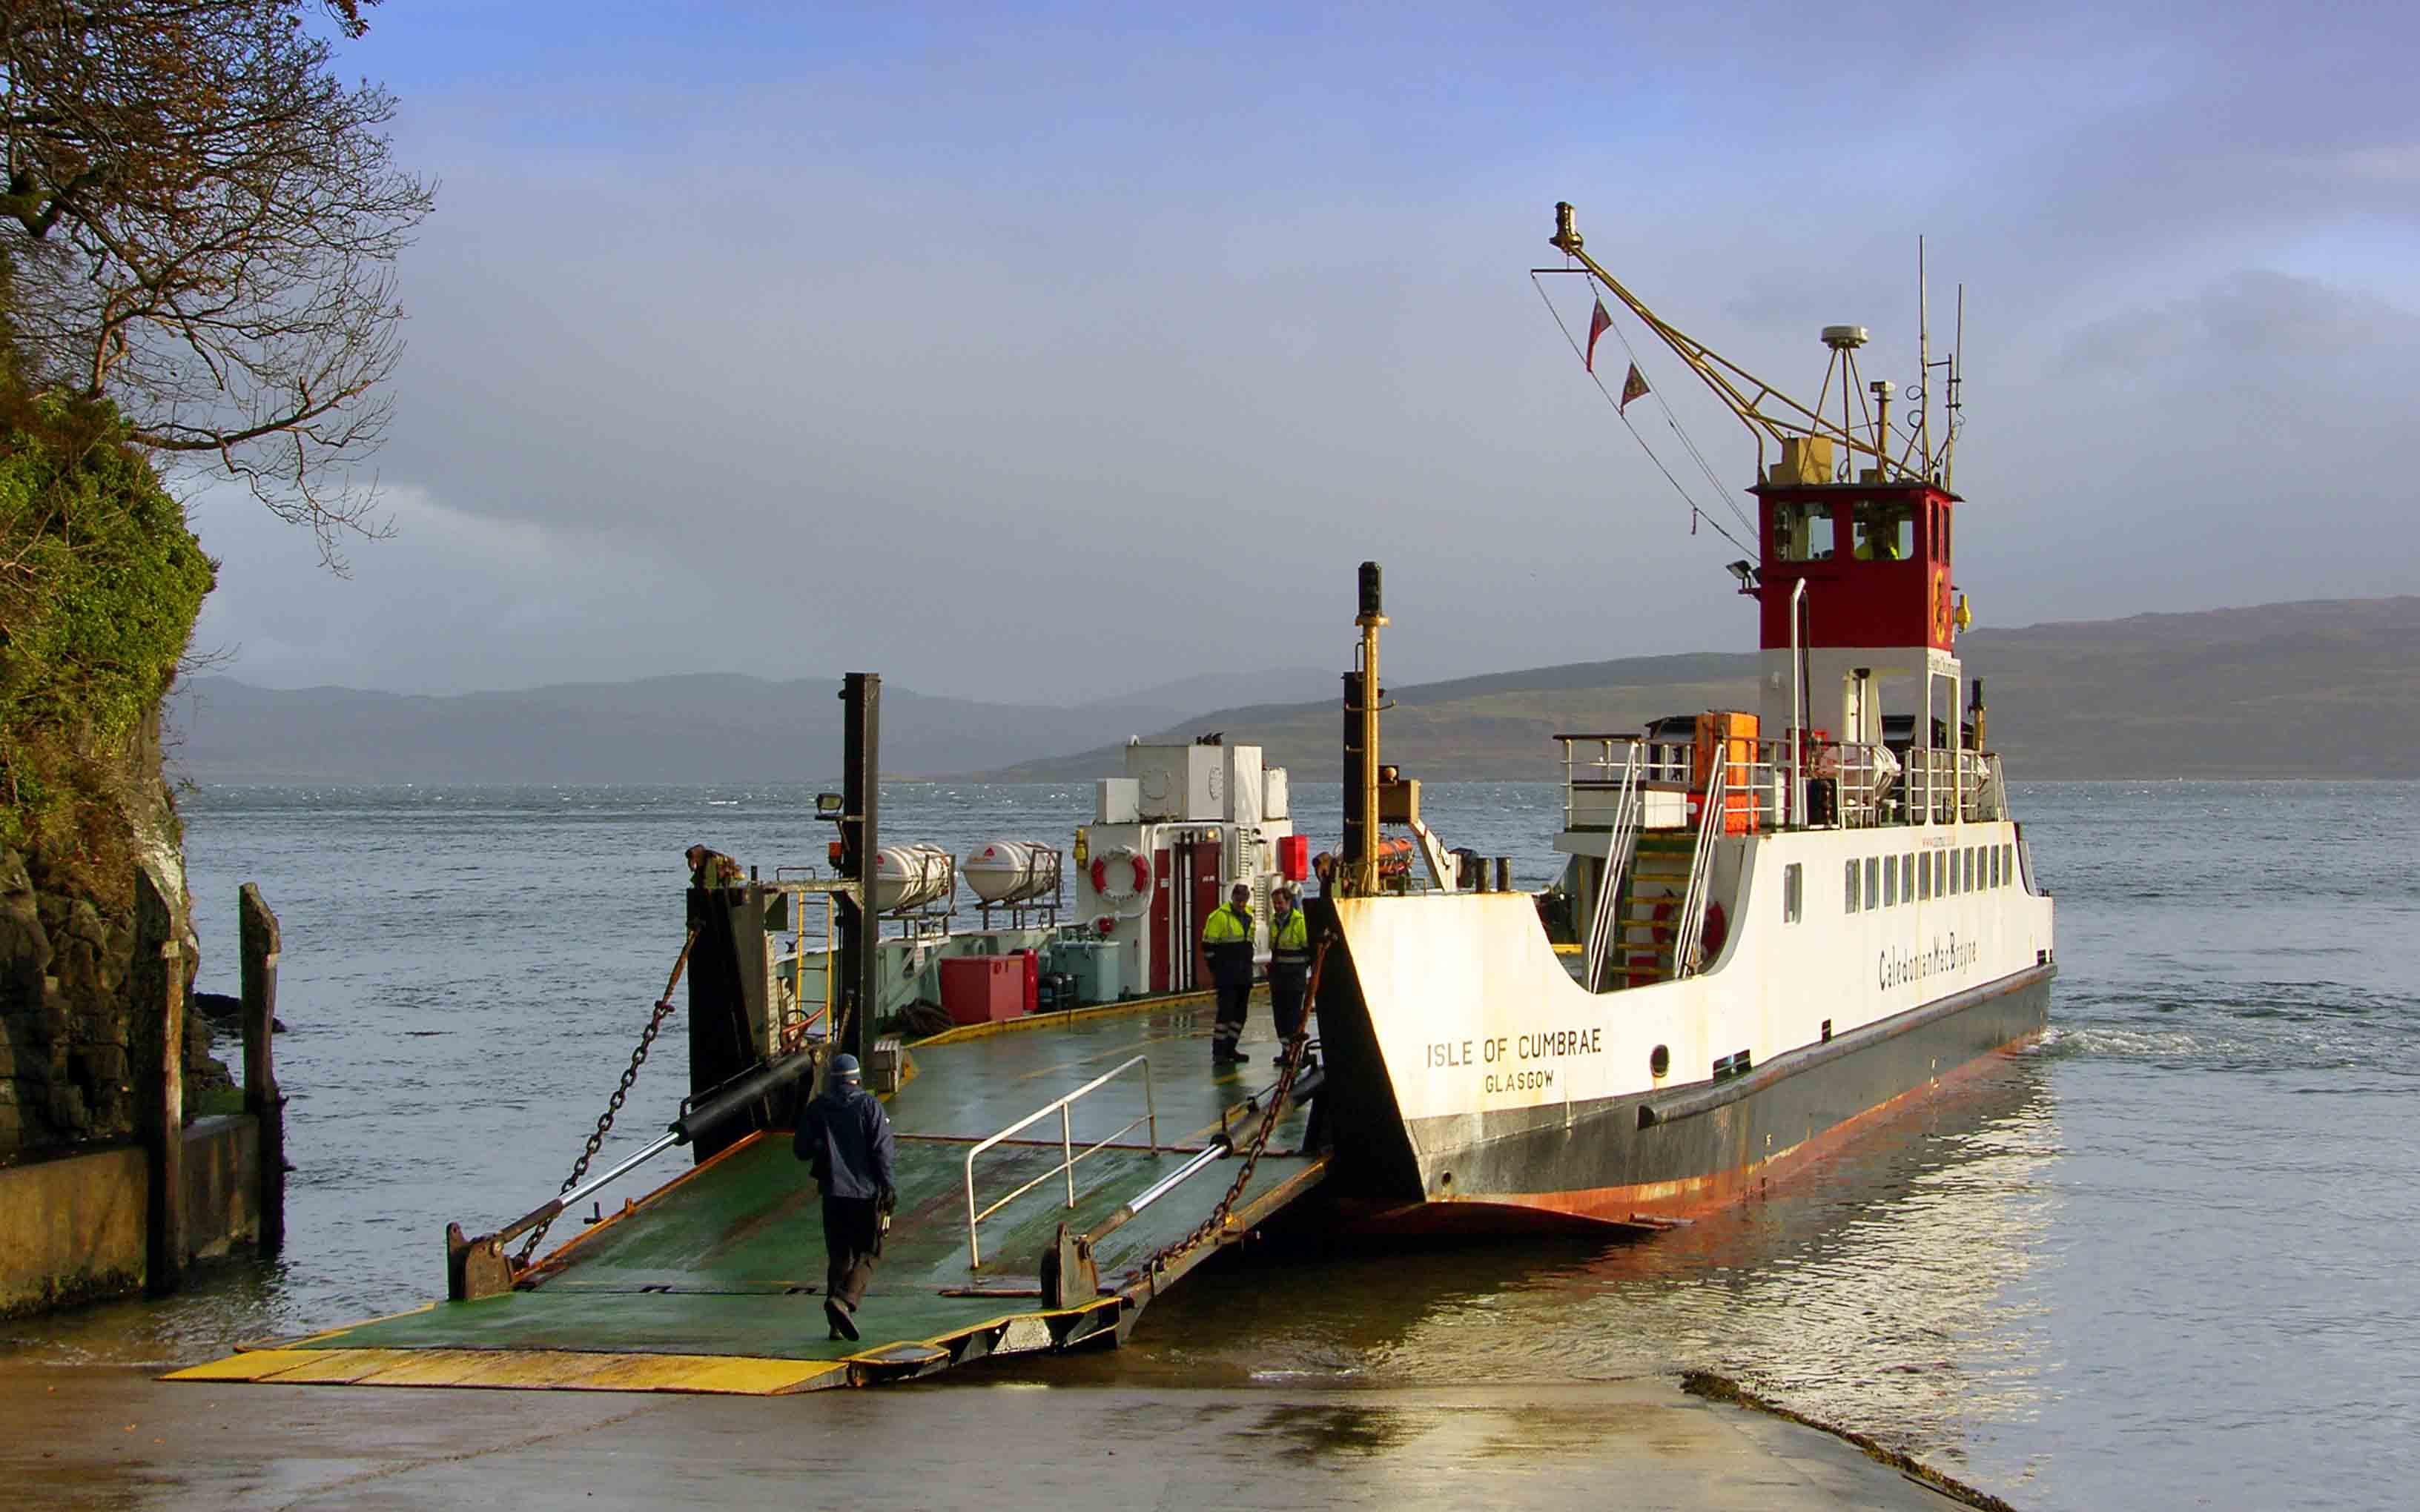 Isle of Cumbrae at Tobermory (Ships of CalMac)